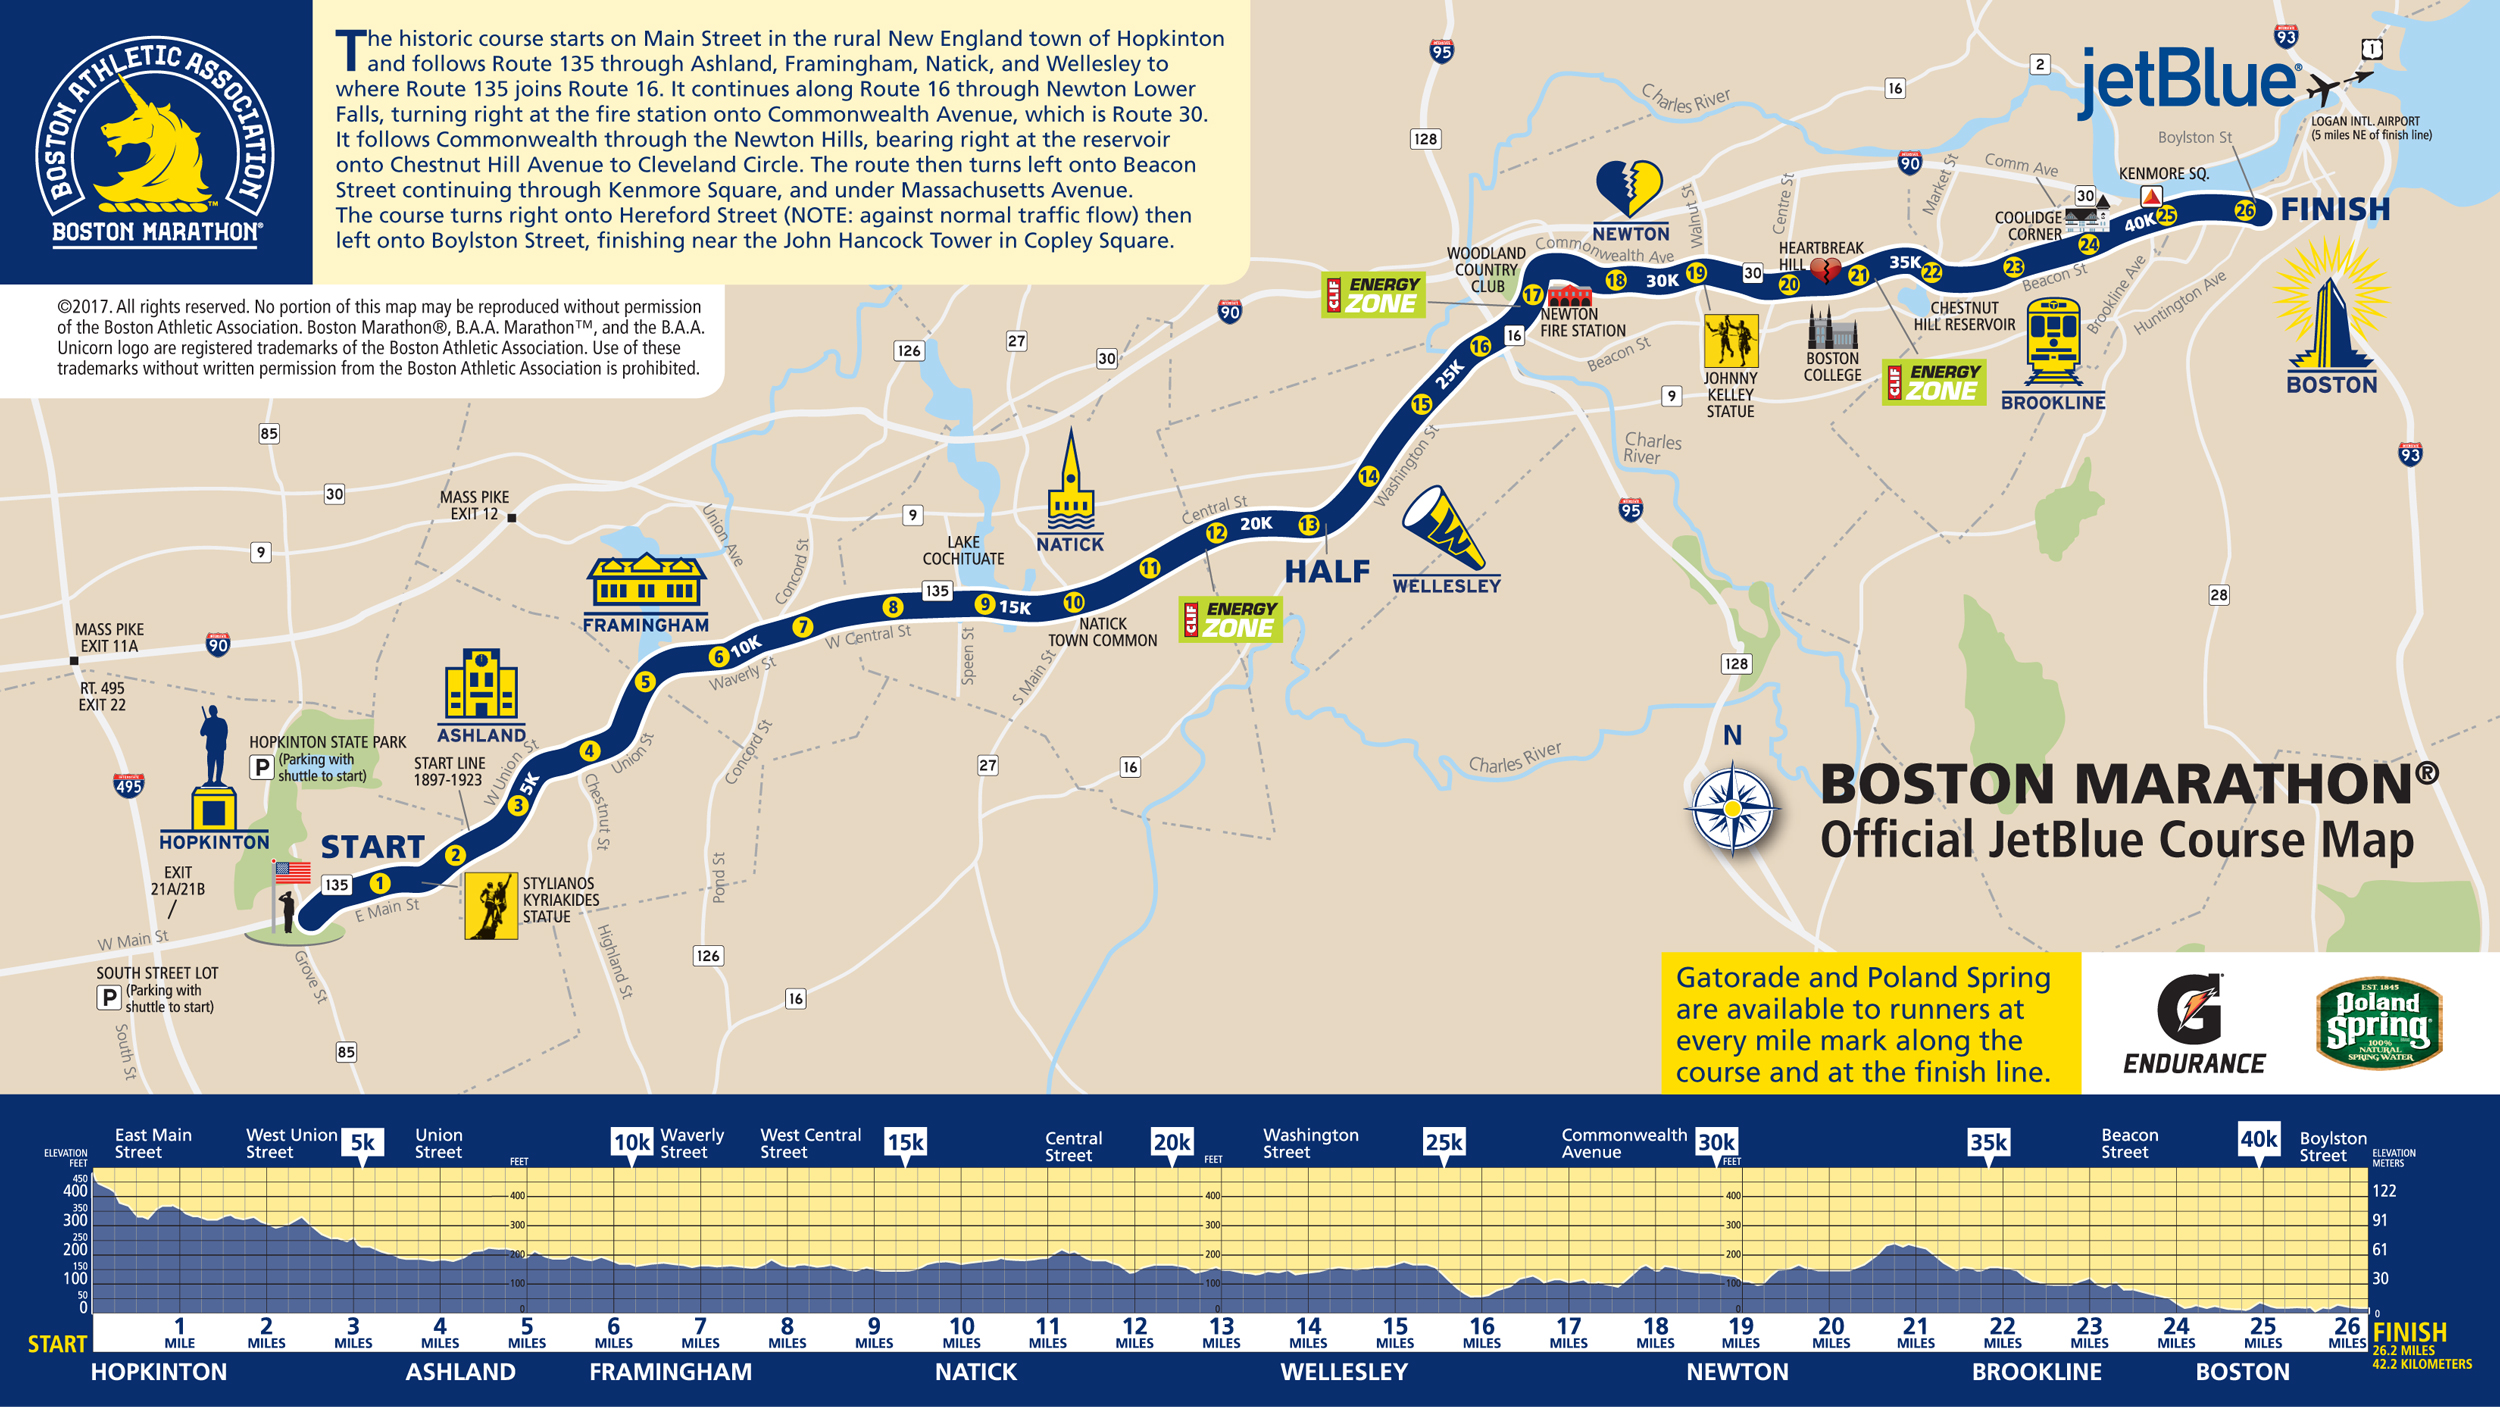 Boston Marathon 2017 Route information course map road closures